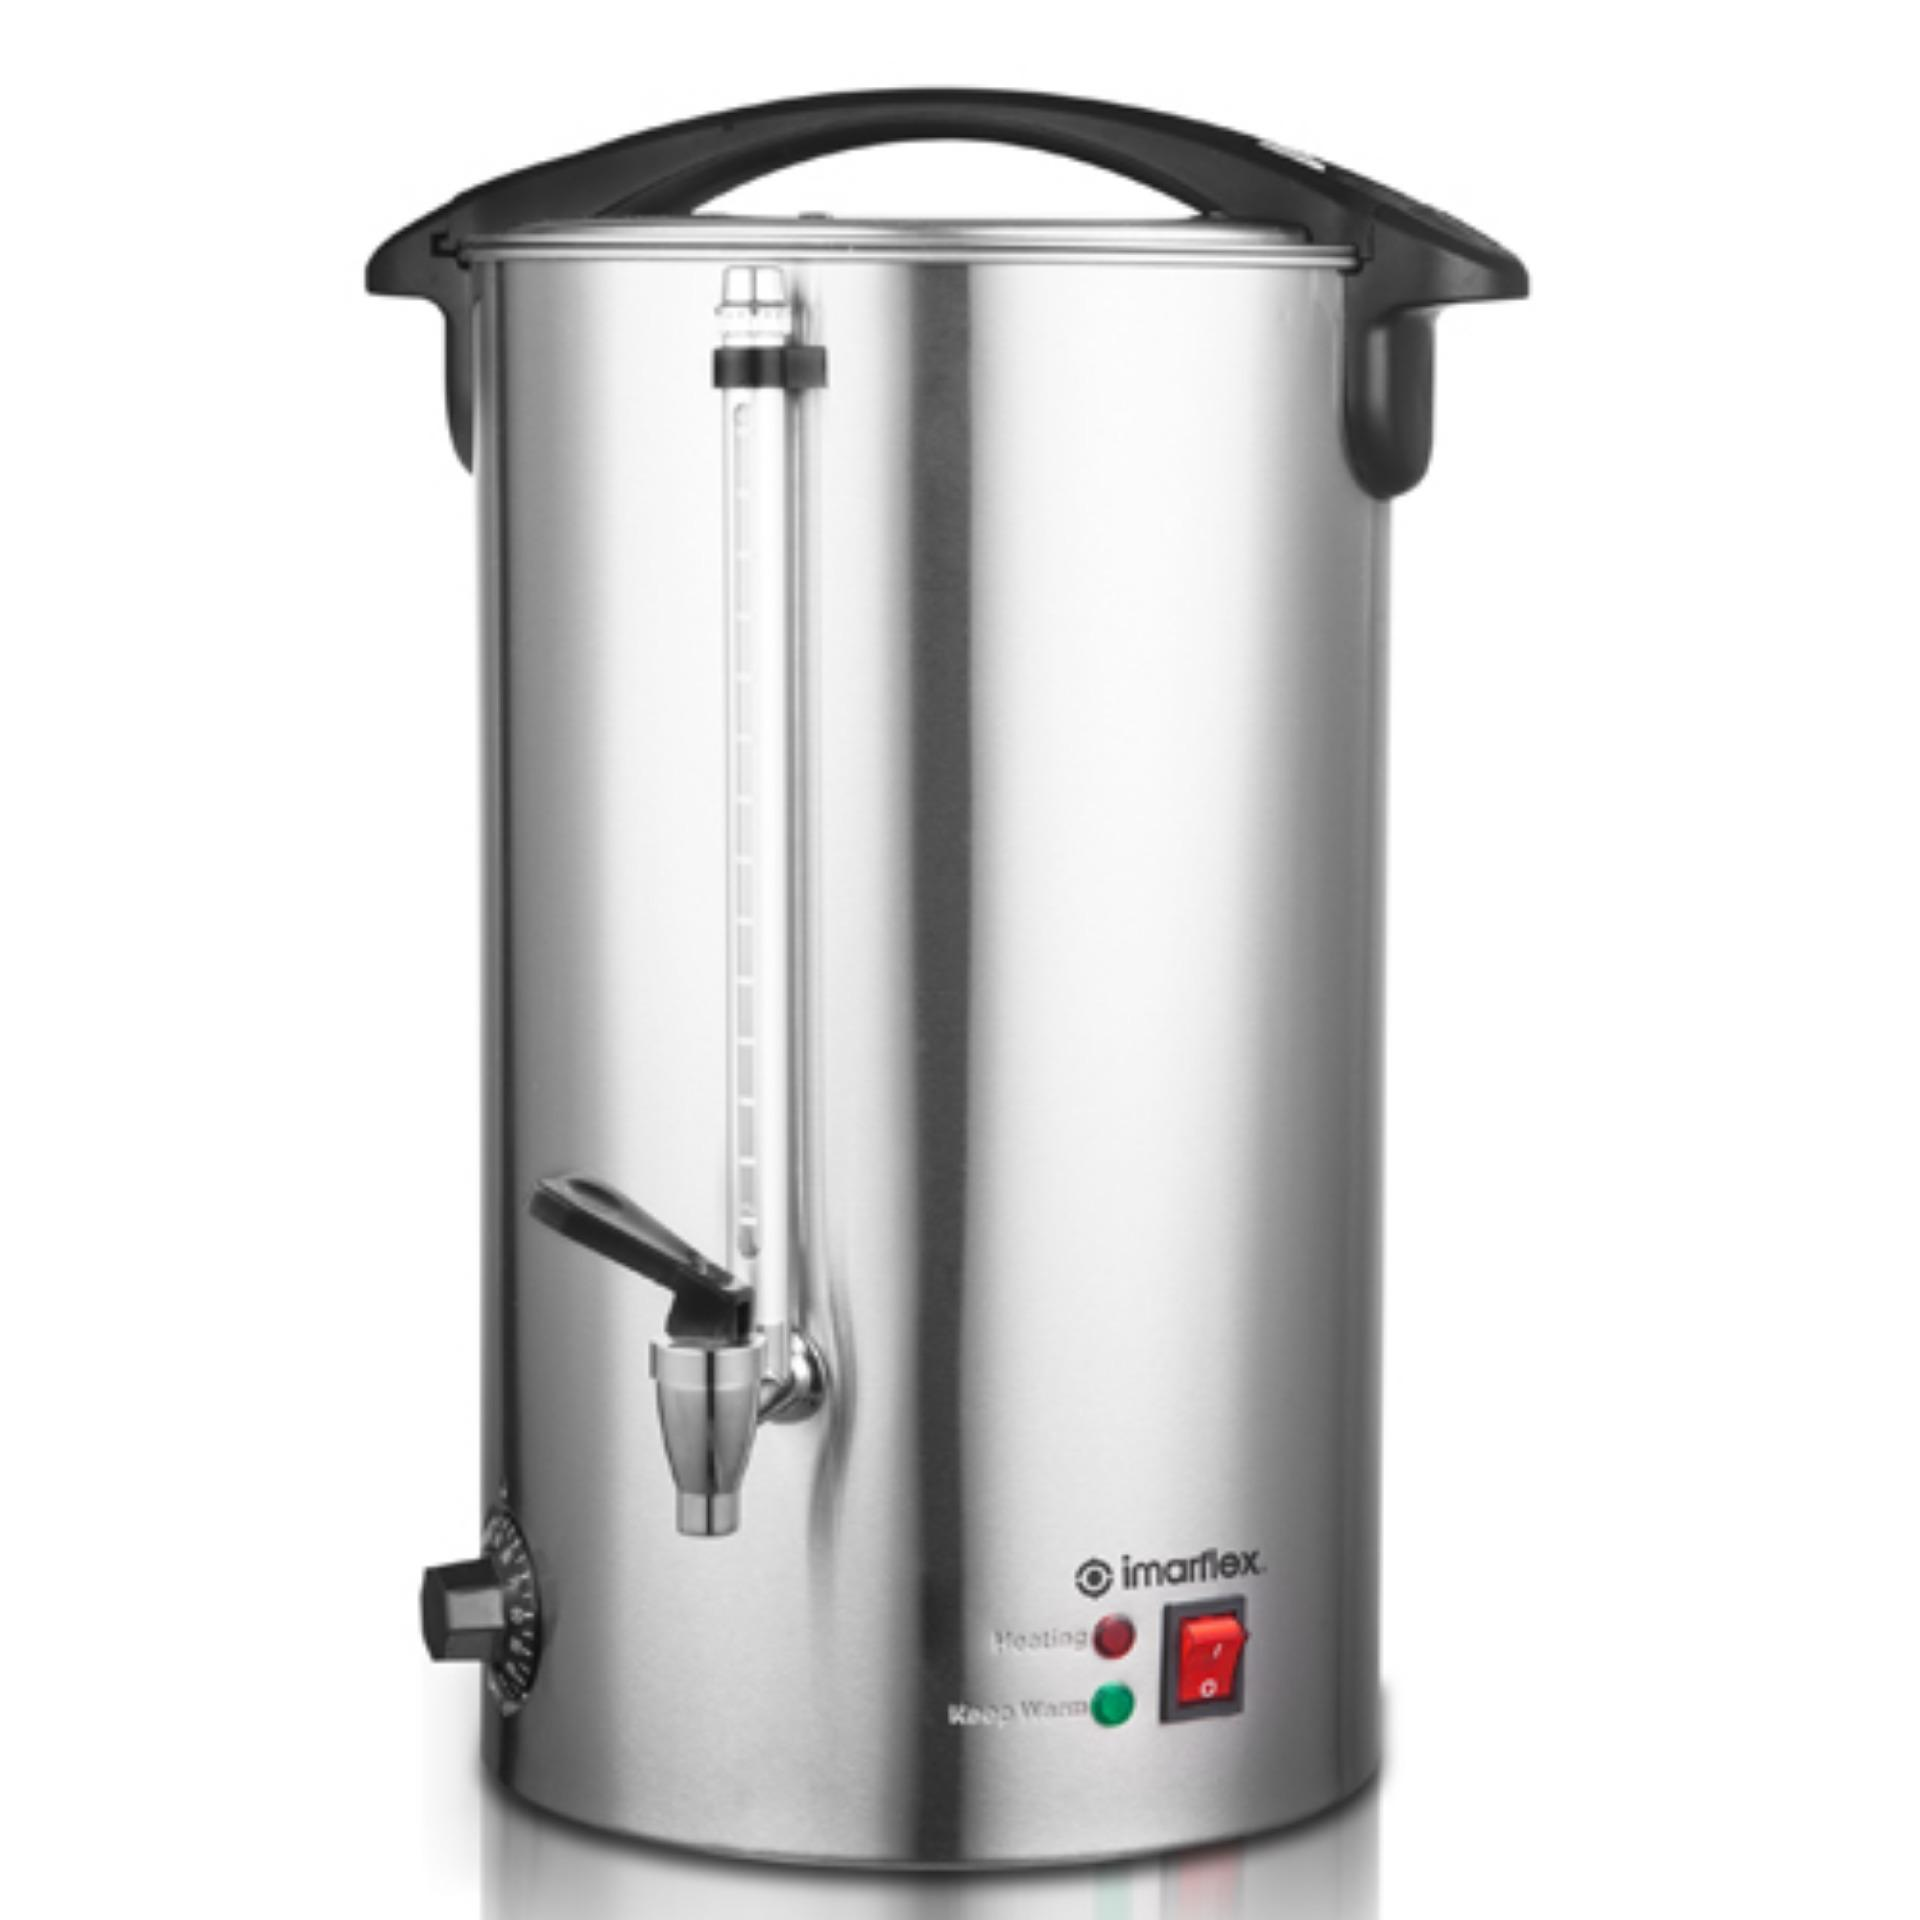 Imarflex Iwb-1600s Water Boiler 16l (stainless) By Imarflex.